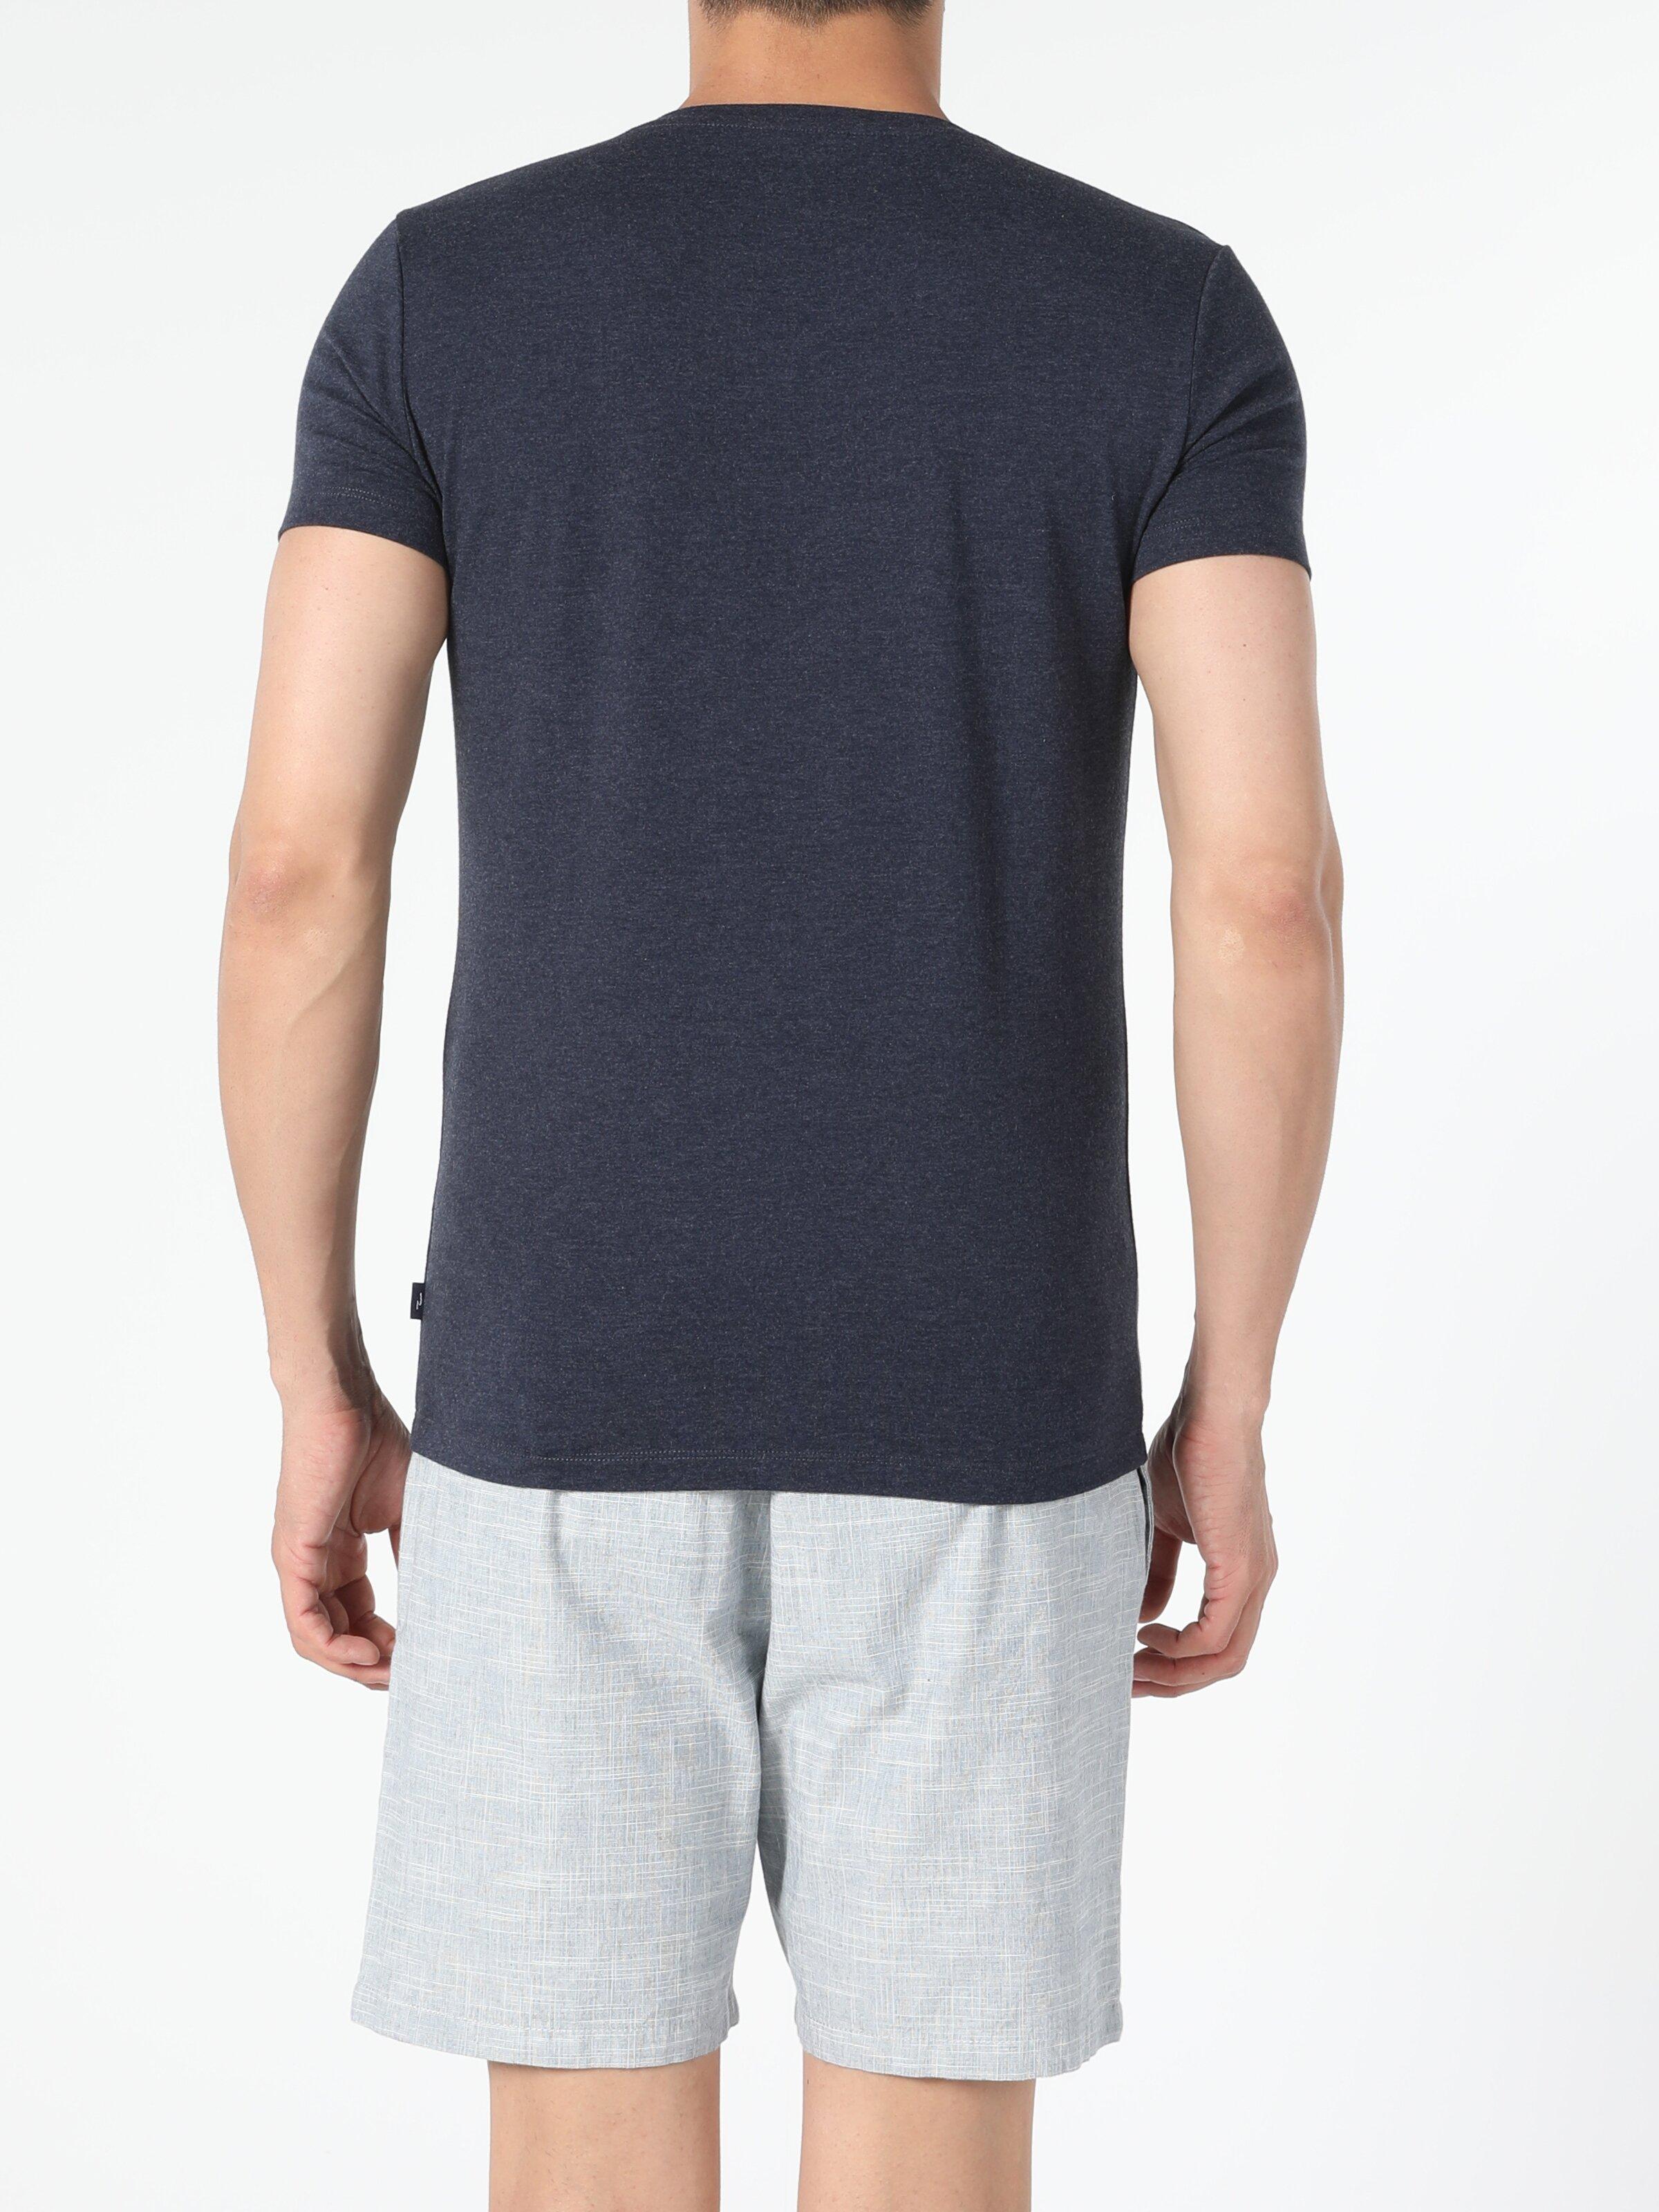 Slim Fit V Yaka Örme Erkek  Kısa Kol Tişört